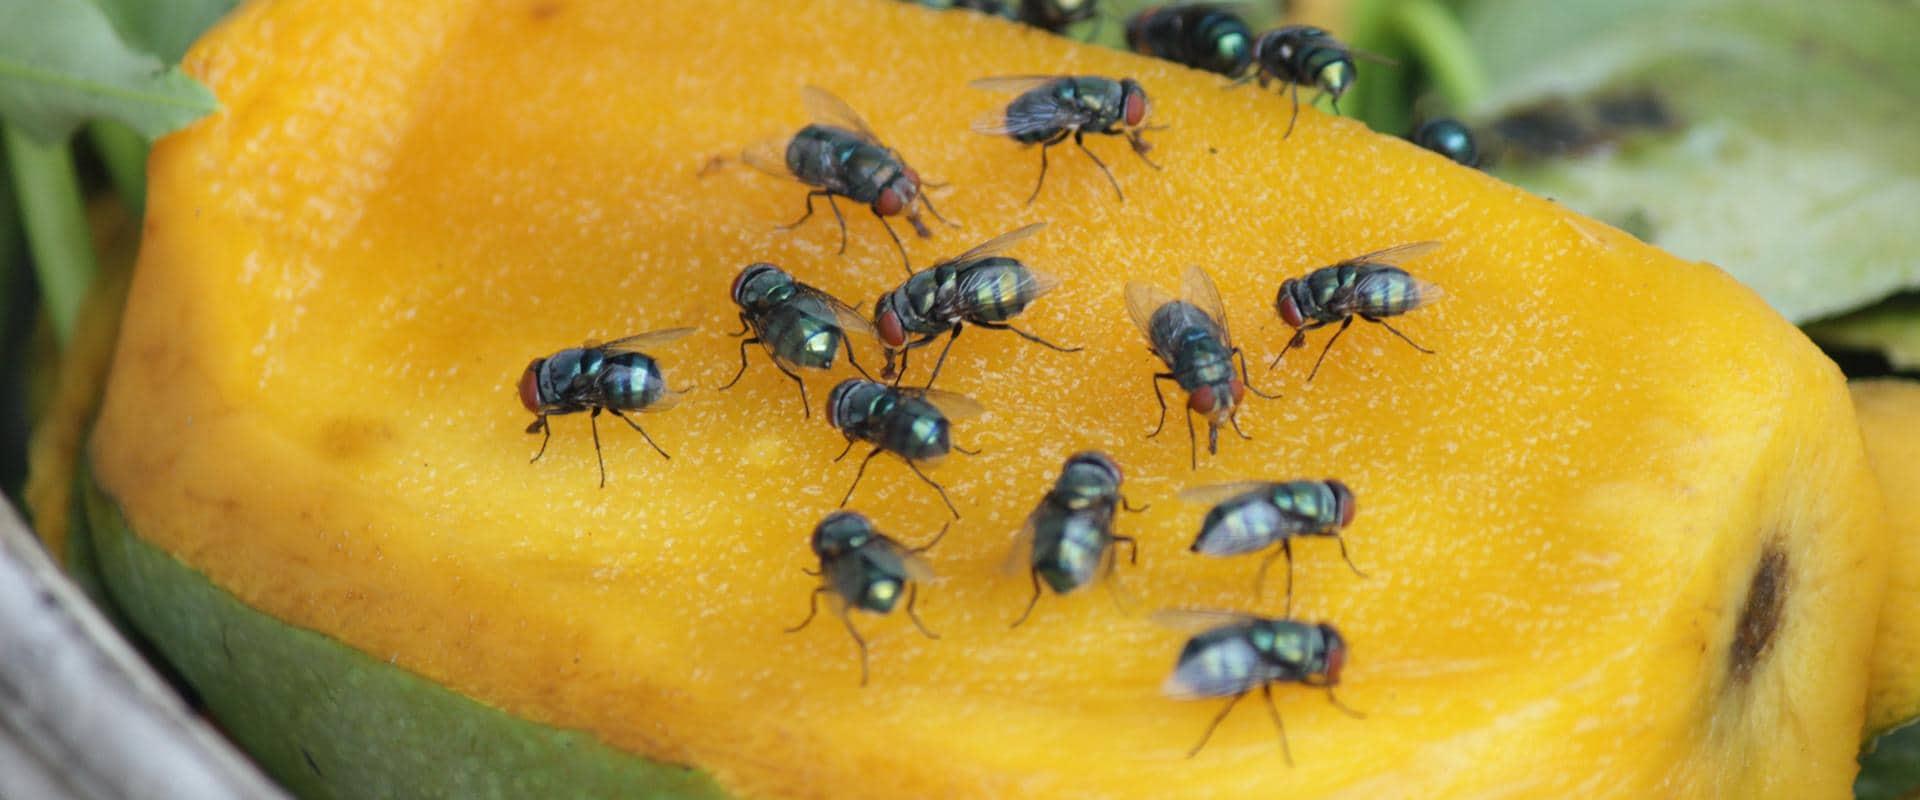 flies on food in cle elum washington